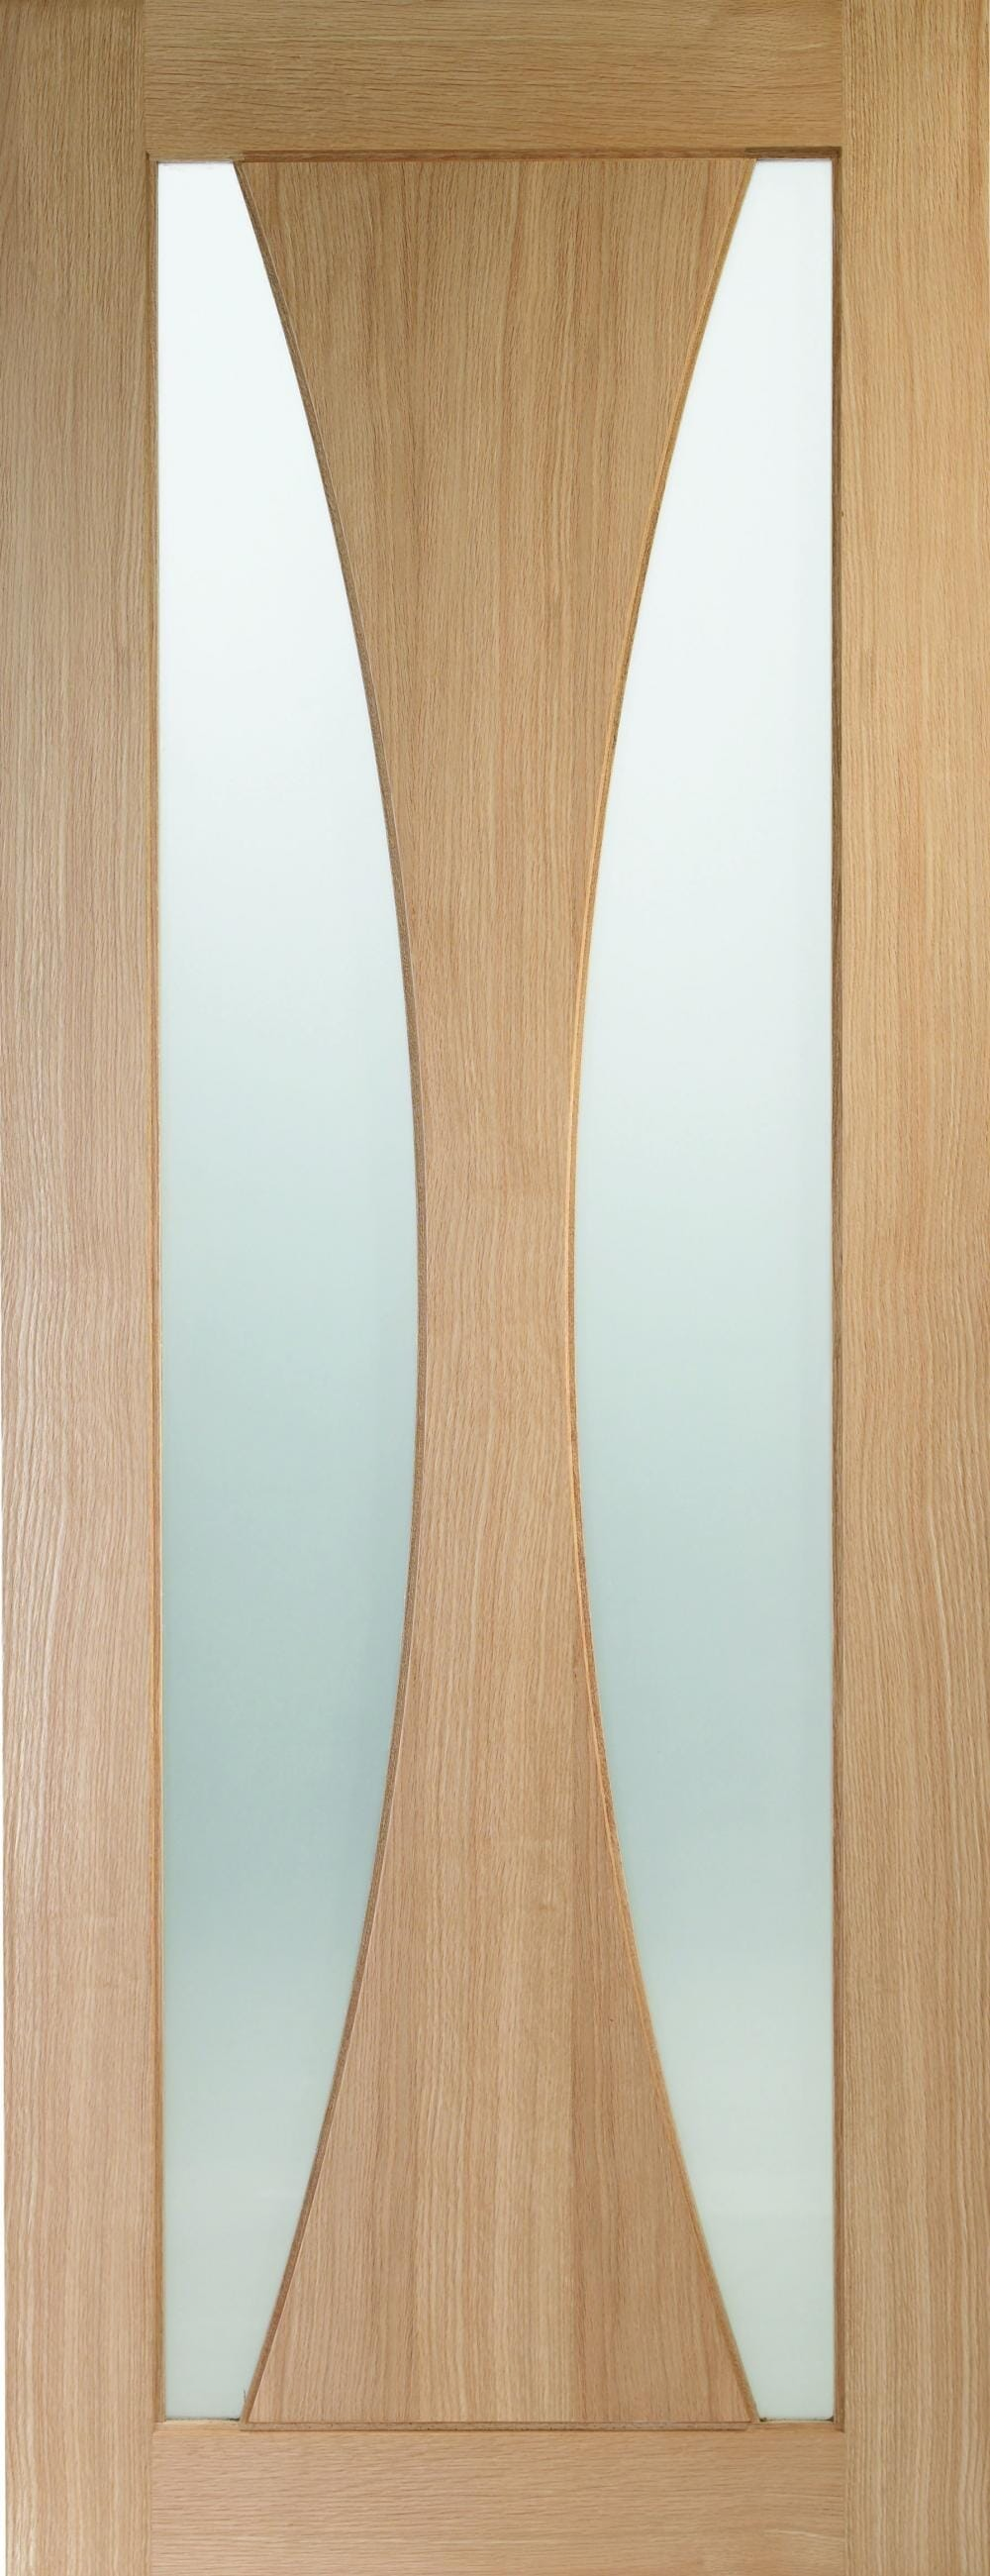 Verona Oak - Prefinished Clear Glass Image